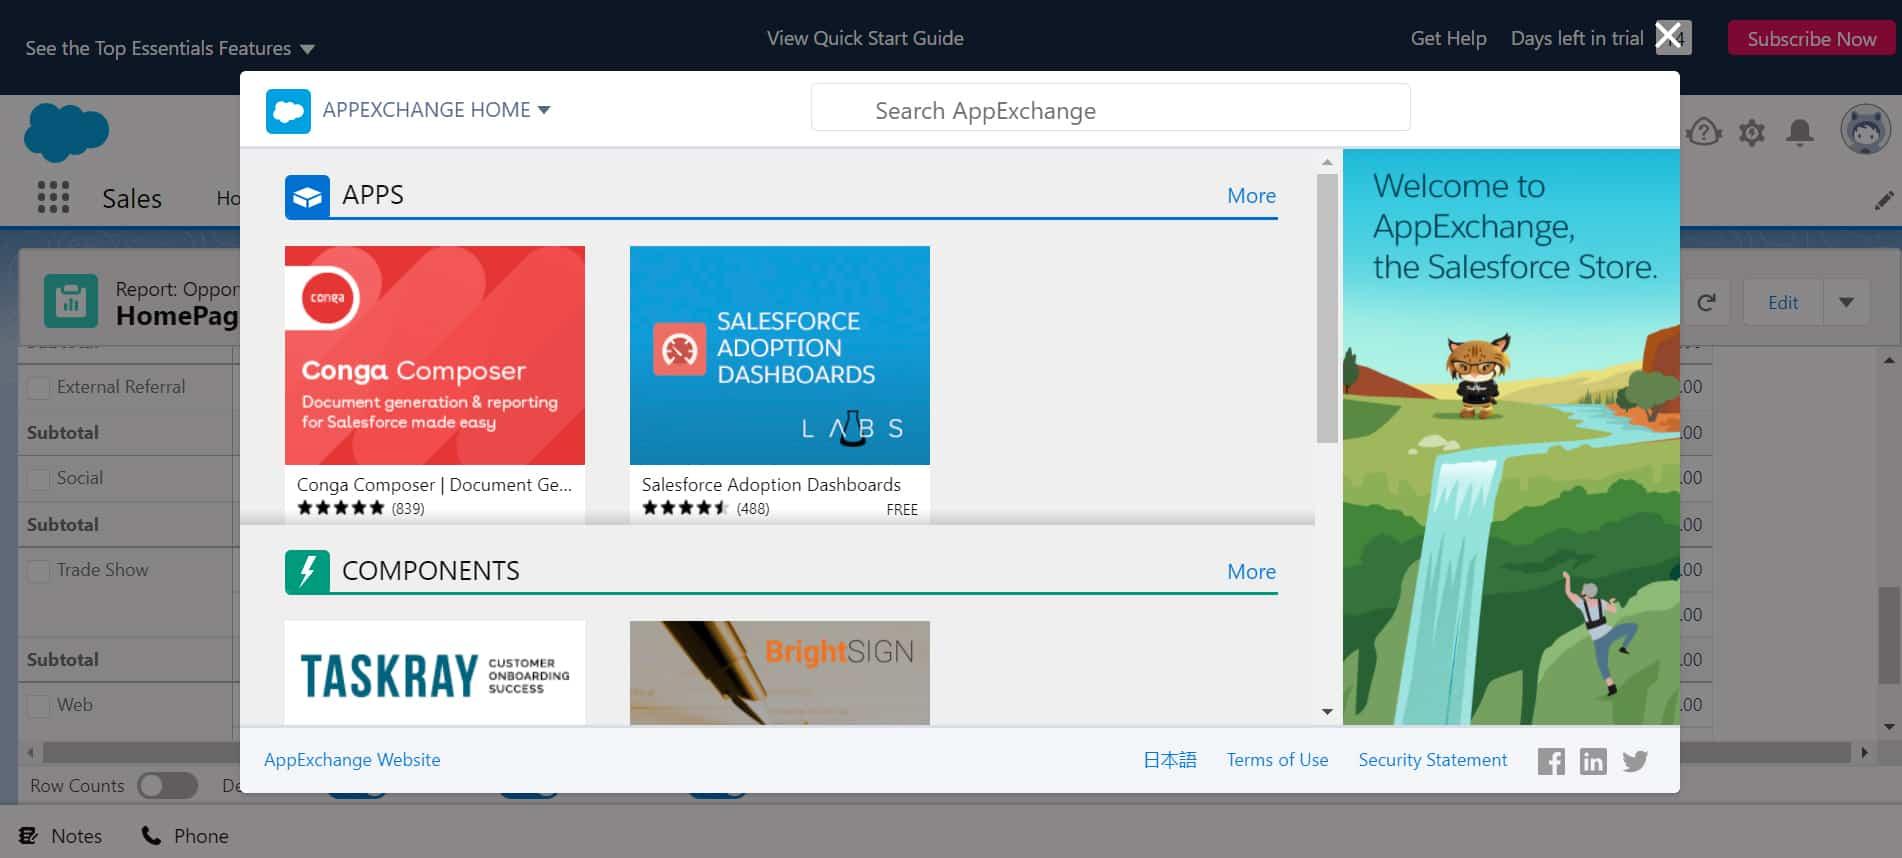 Screenshot of Salesforce AppExchange homepage